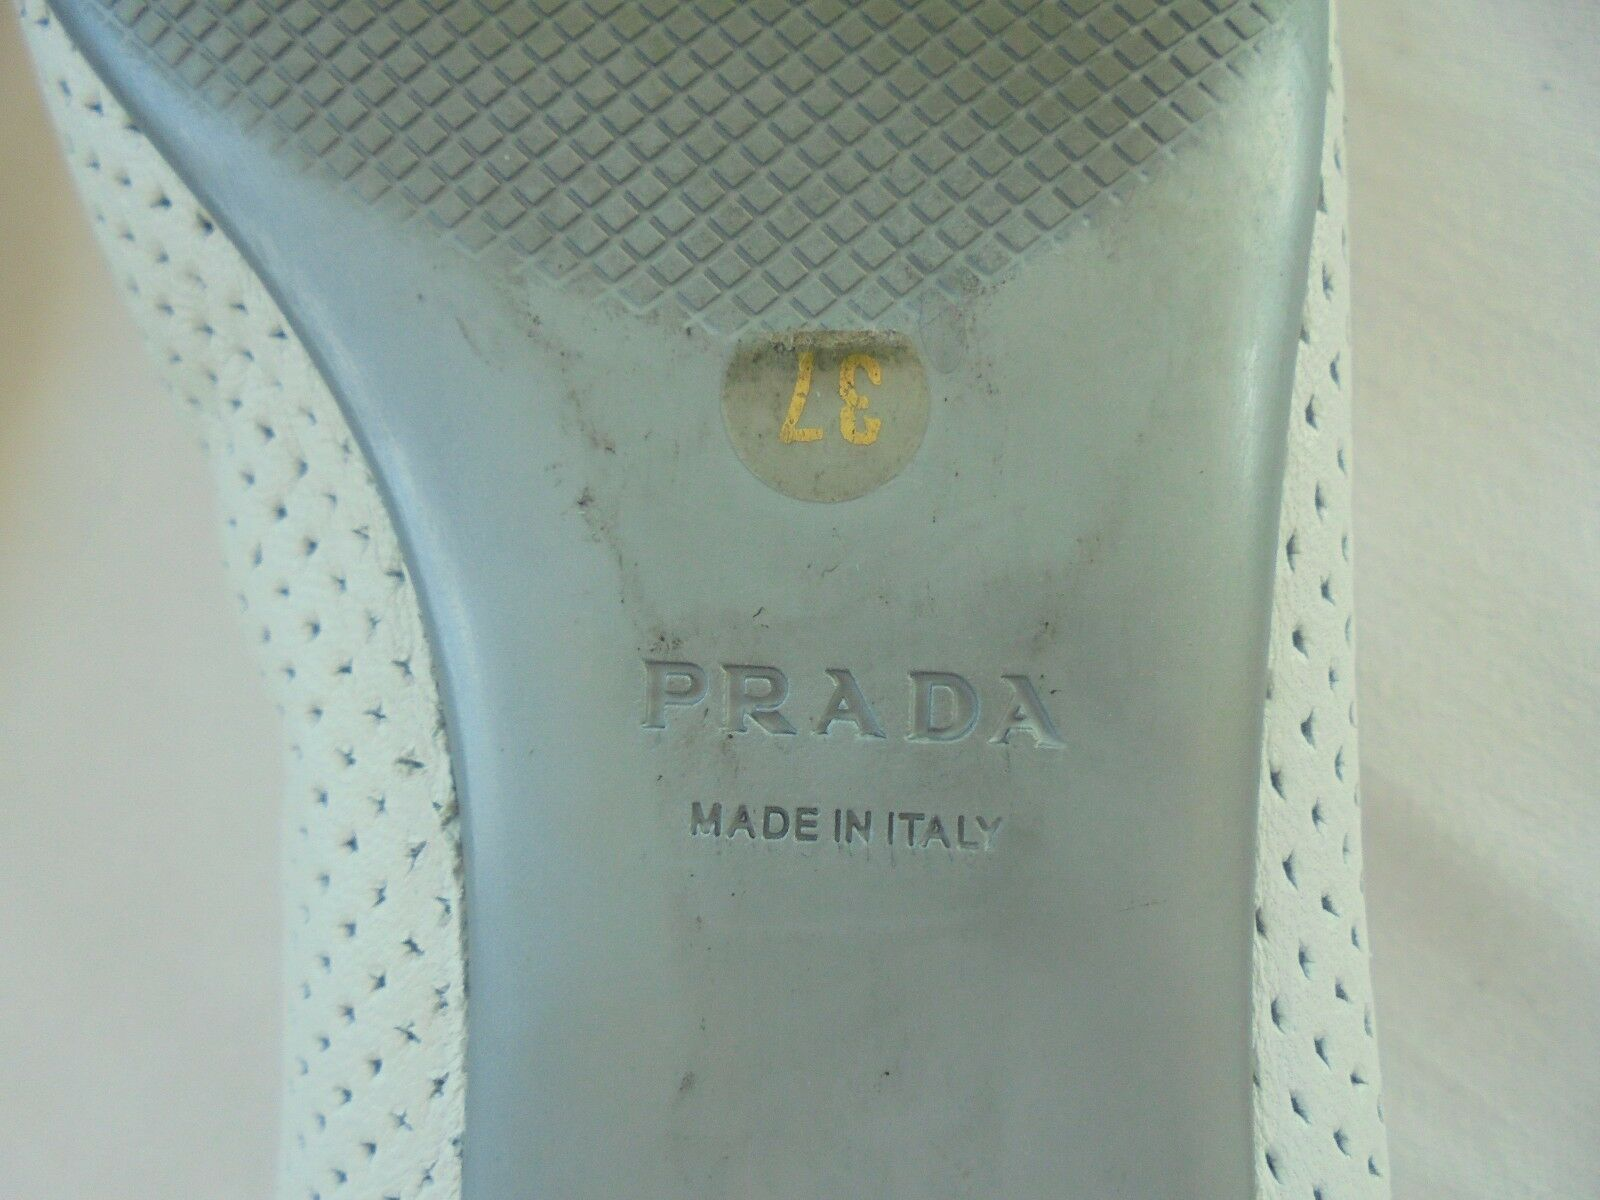 Original Prada Leder Ballerinas NP  TOP Designer 37 Luxus Schuhe Pumps Gr. 37 Designer faa93a